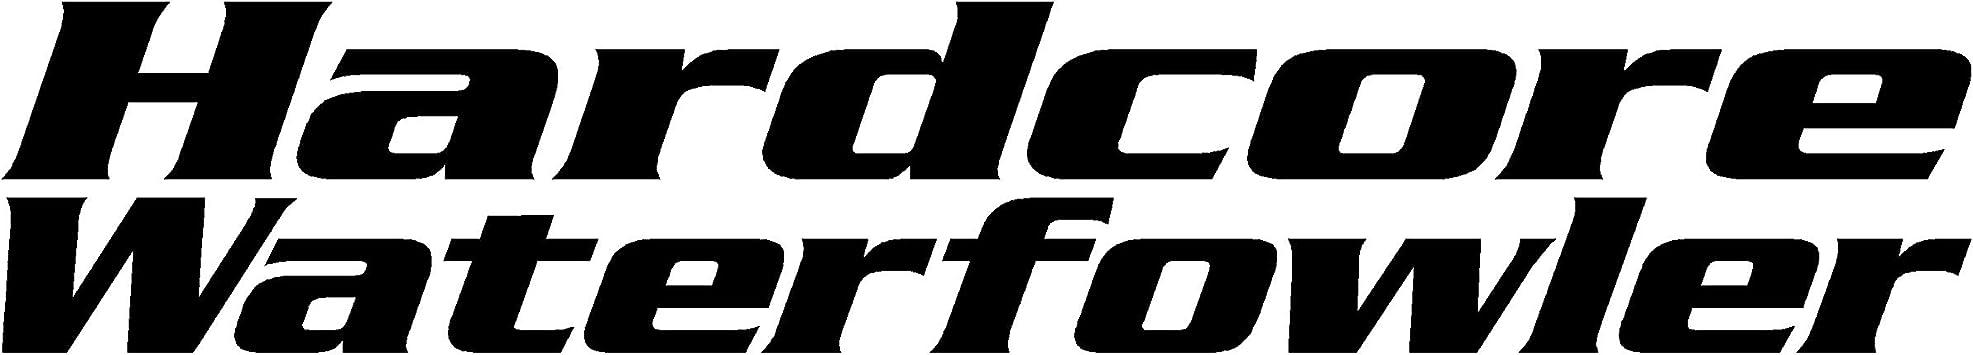 Hardcore Waterfowler Decal Waterfowl Hunters Decal \u2013 waterfowl hunting decals for trucks 2405